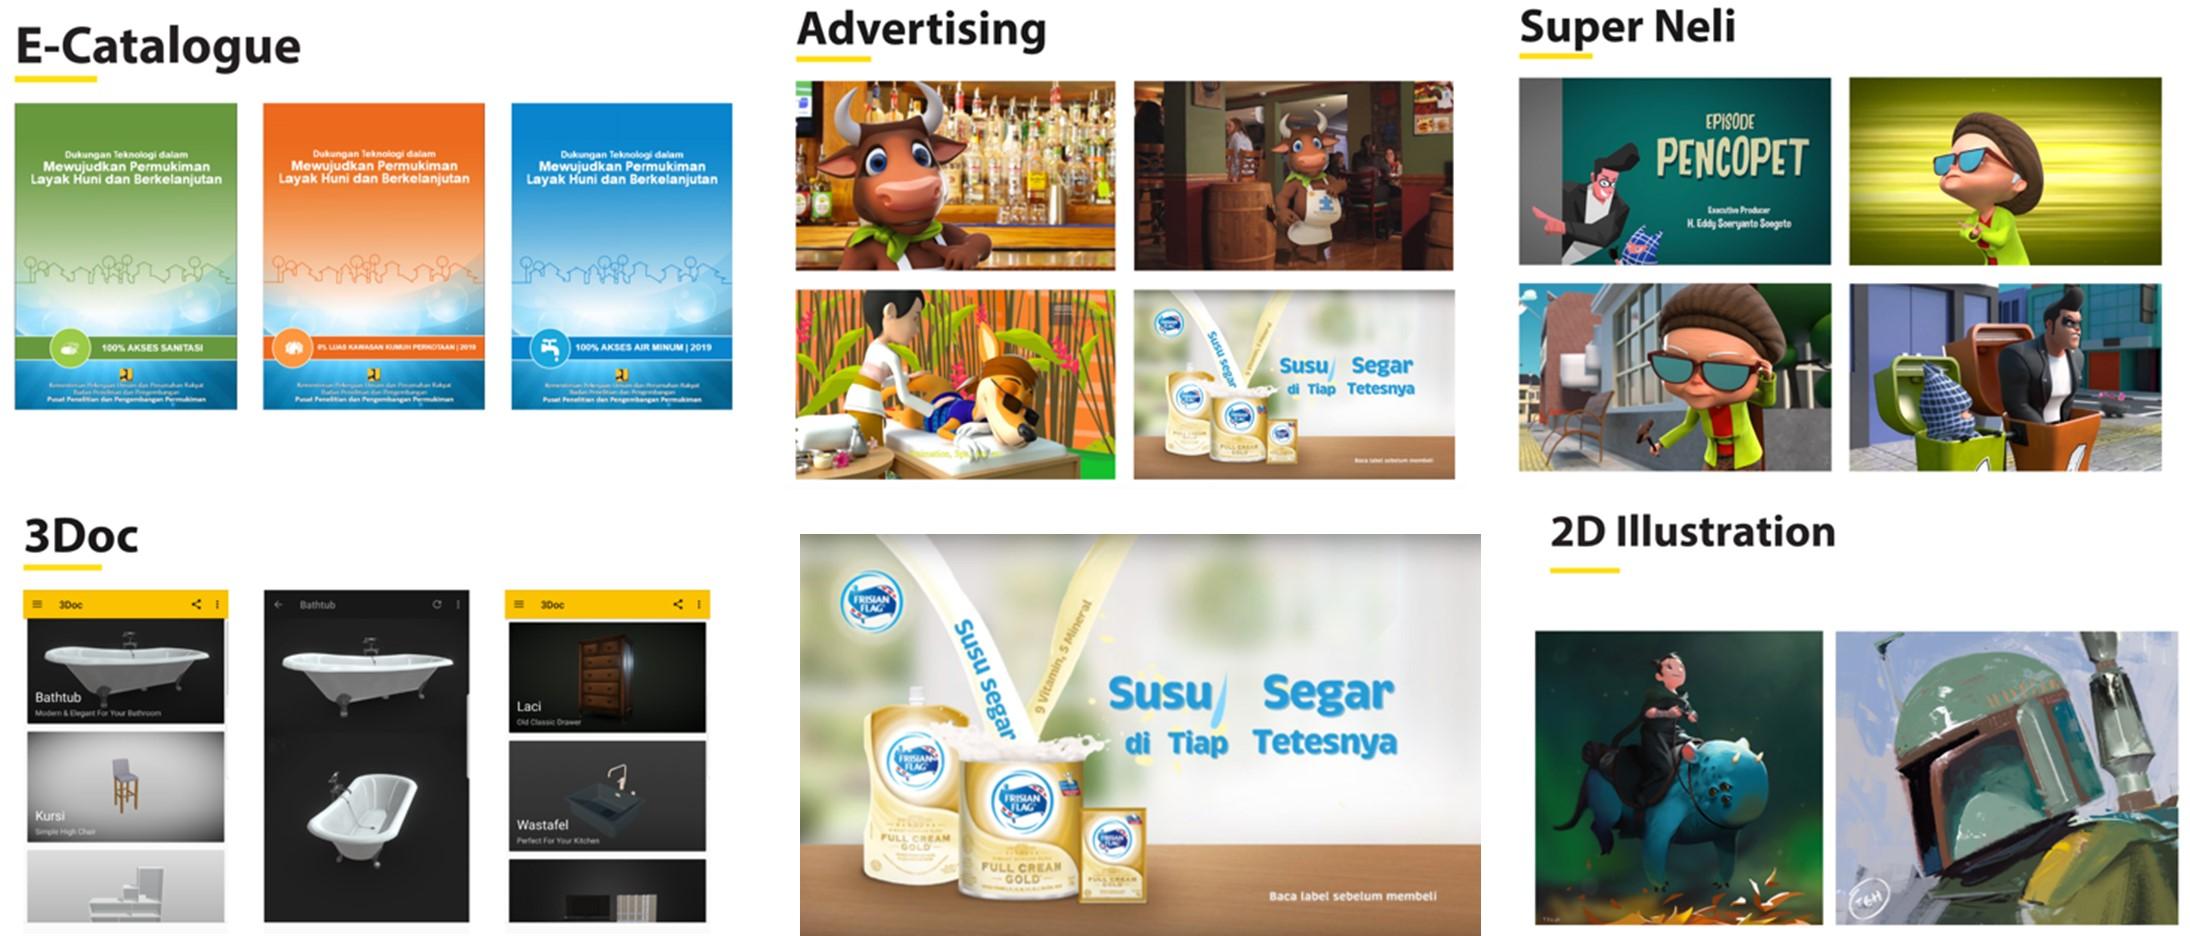 E-Catalogue, Advertising, 3Doc, 2D Illustration